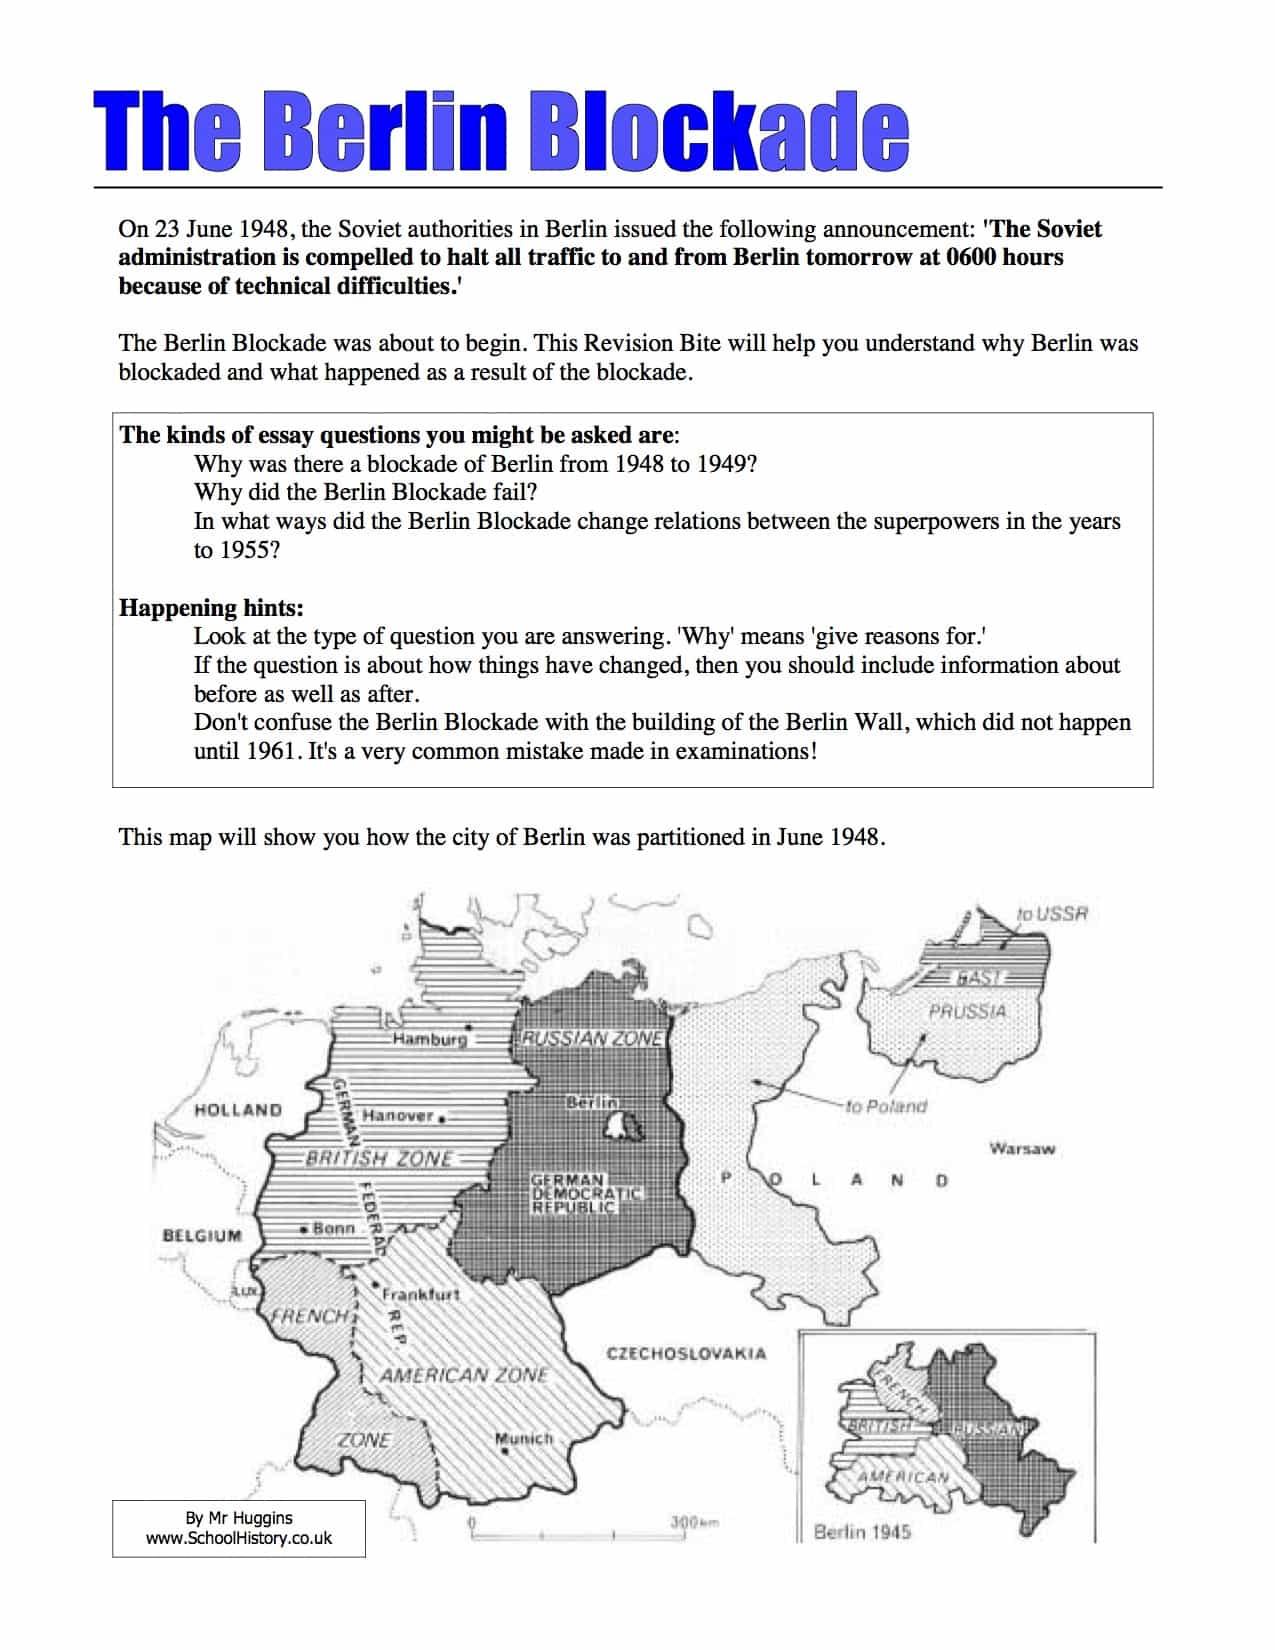 The Blockade Of Berlin Summary Worksheet